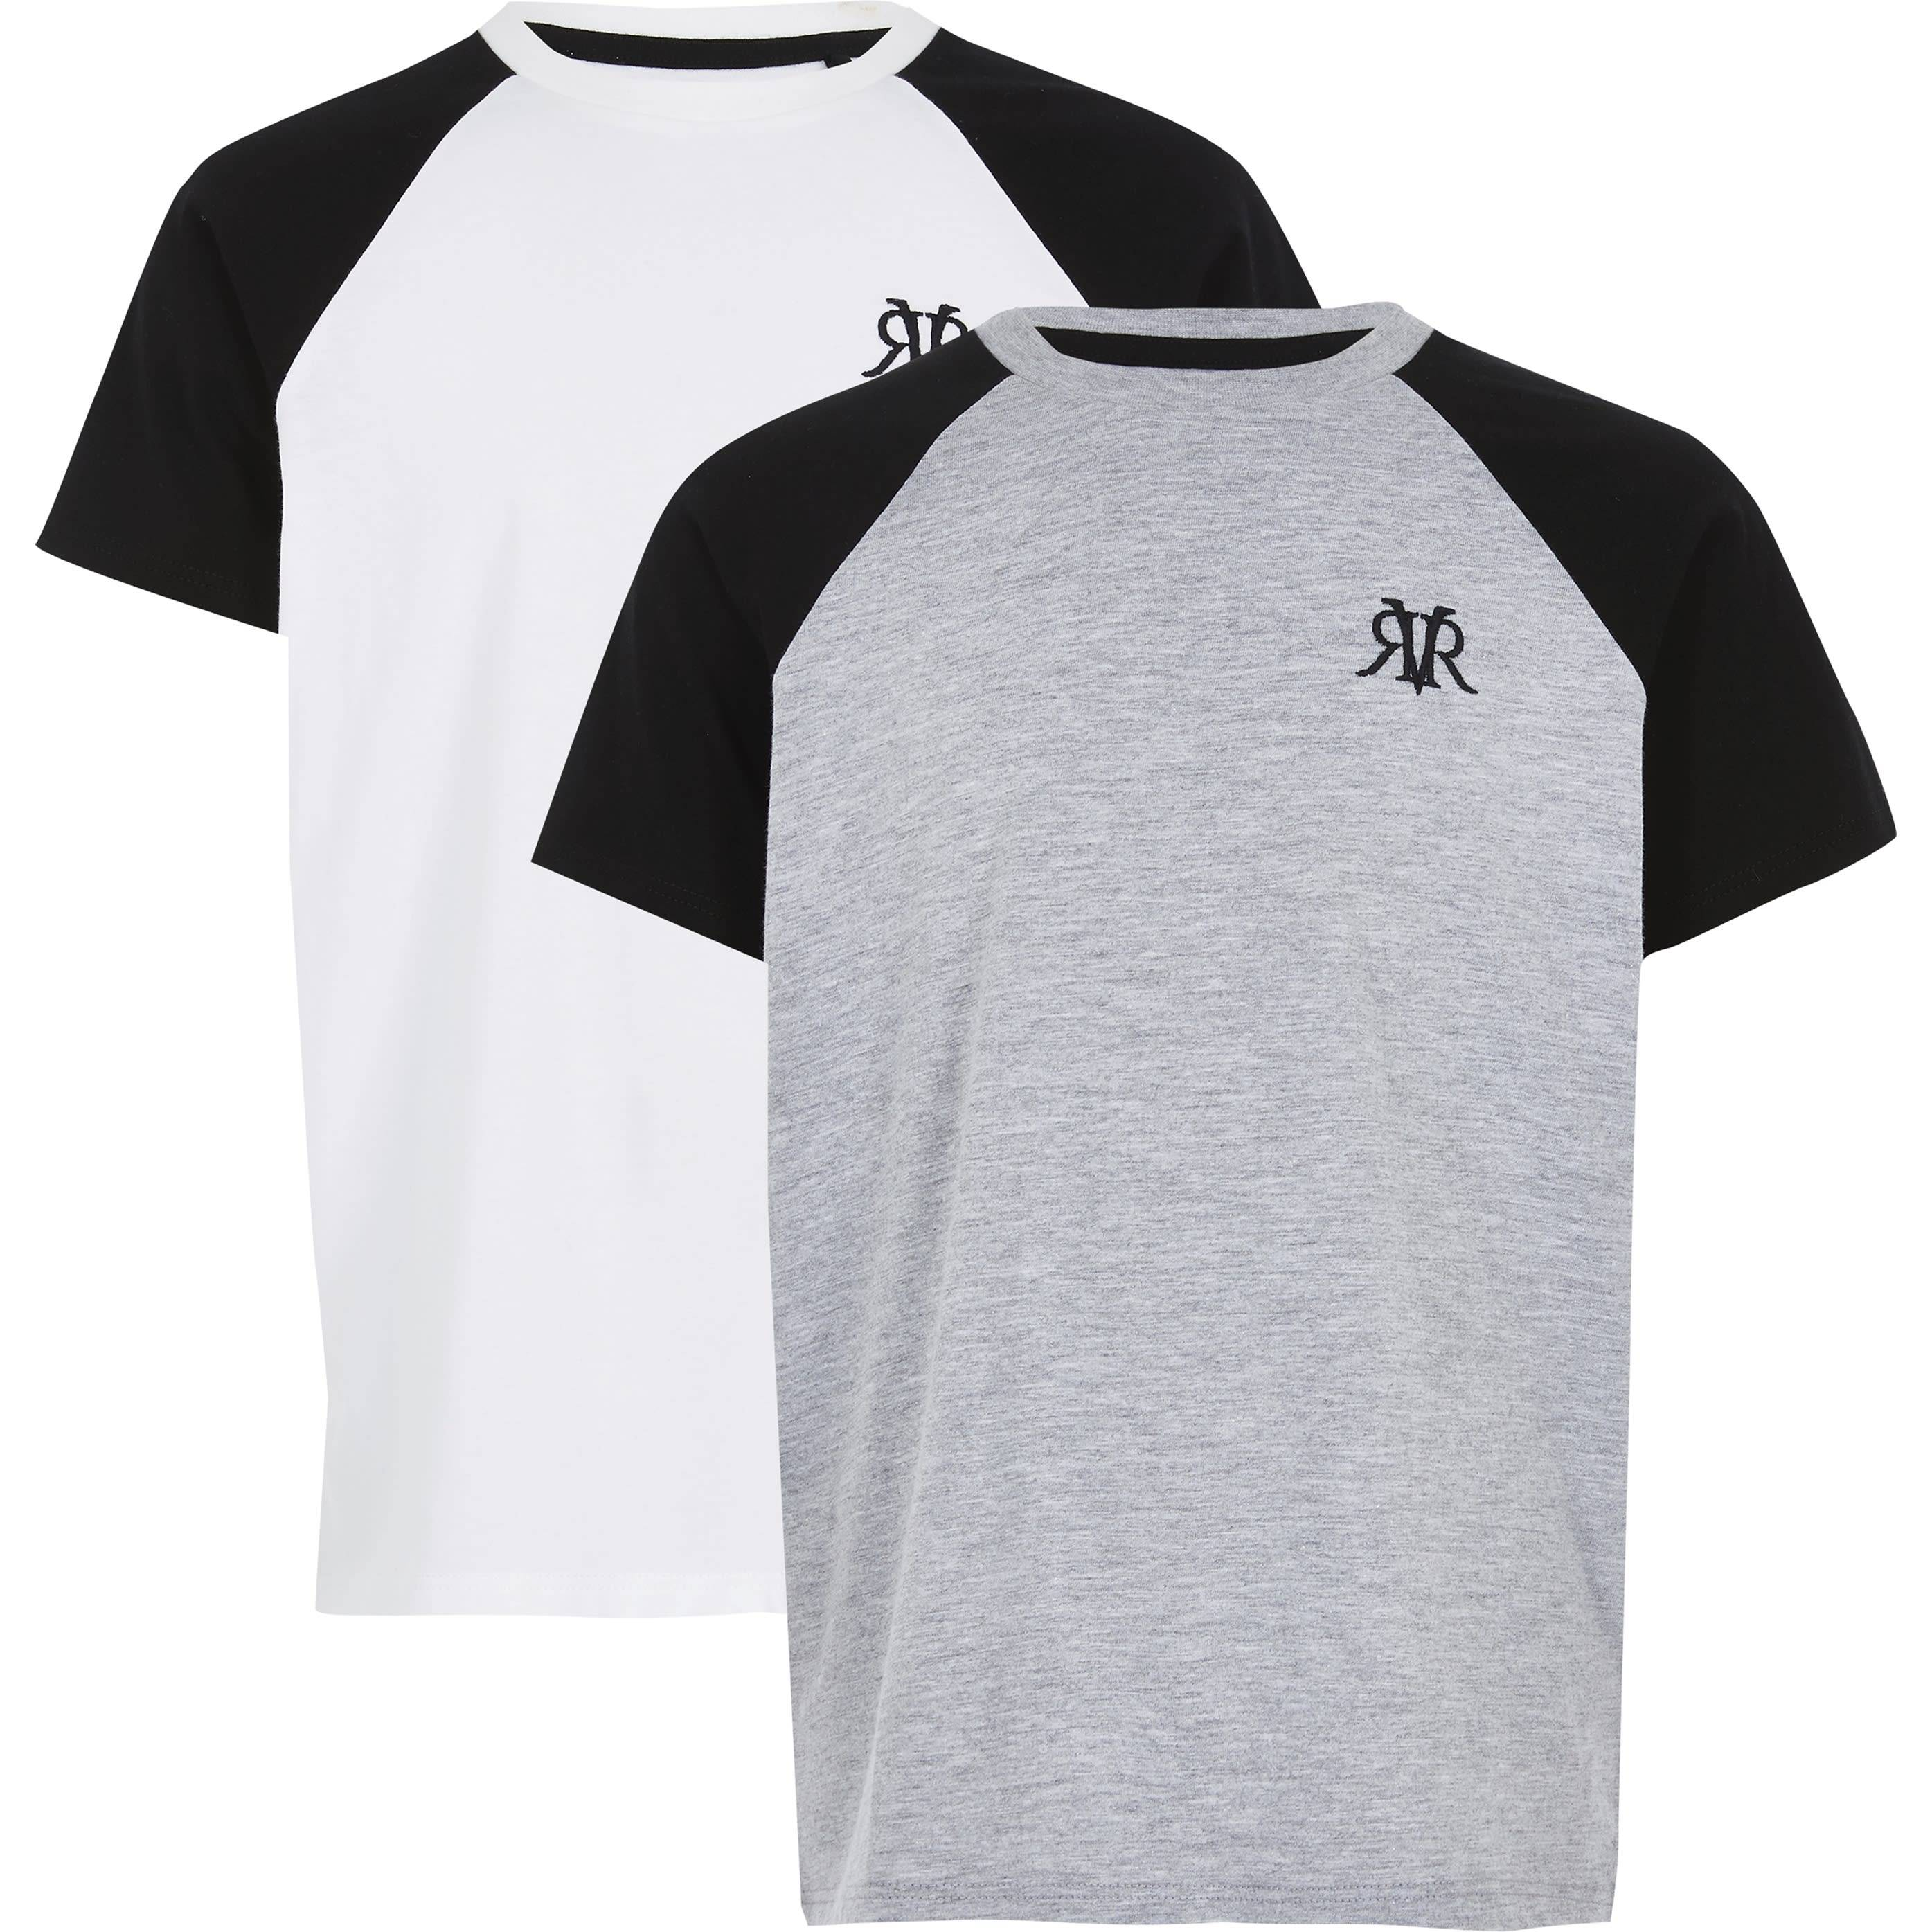 River Island Boys White RVR raglan T-shirt 2 pack (5-6 Yrs)